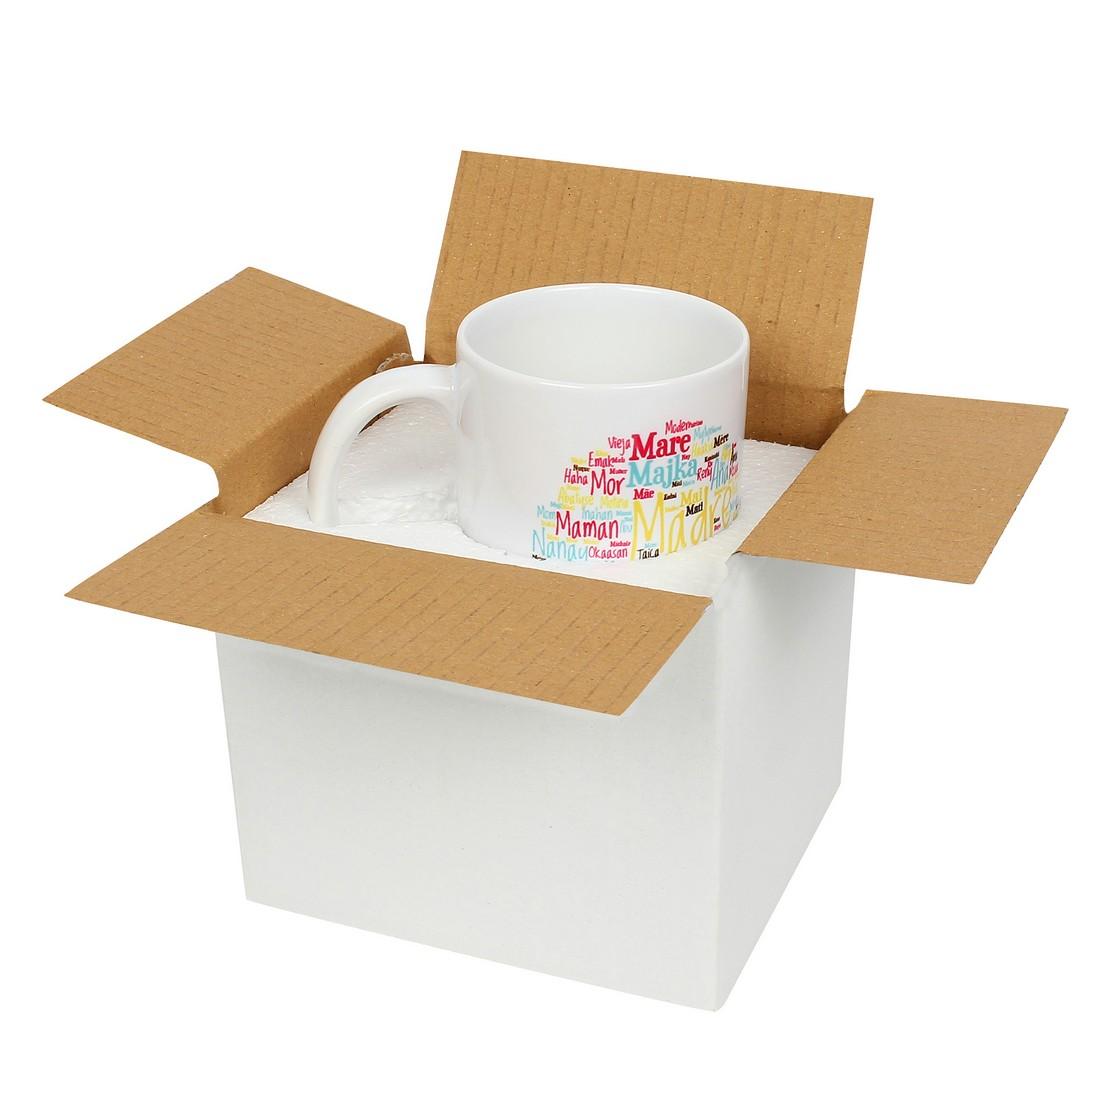 Sattva Premium 350 ML Digital Printed Ceramic Mug For Mother/Mom/Mummy/Mama/Mother;s Day Special Occassion - MUG030     Sattva Premium 350 ML Digital Printed Ceramic Mug For Mother/Mom/Mummy/Mama/Mother;s Day Special Occassion - MUG030